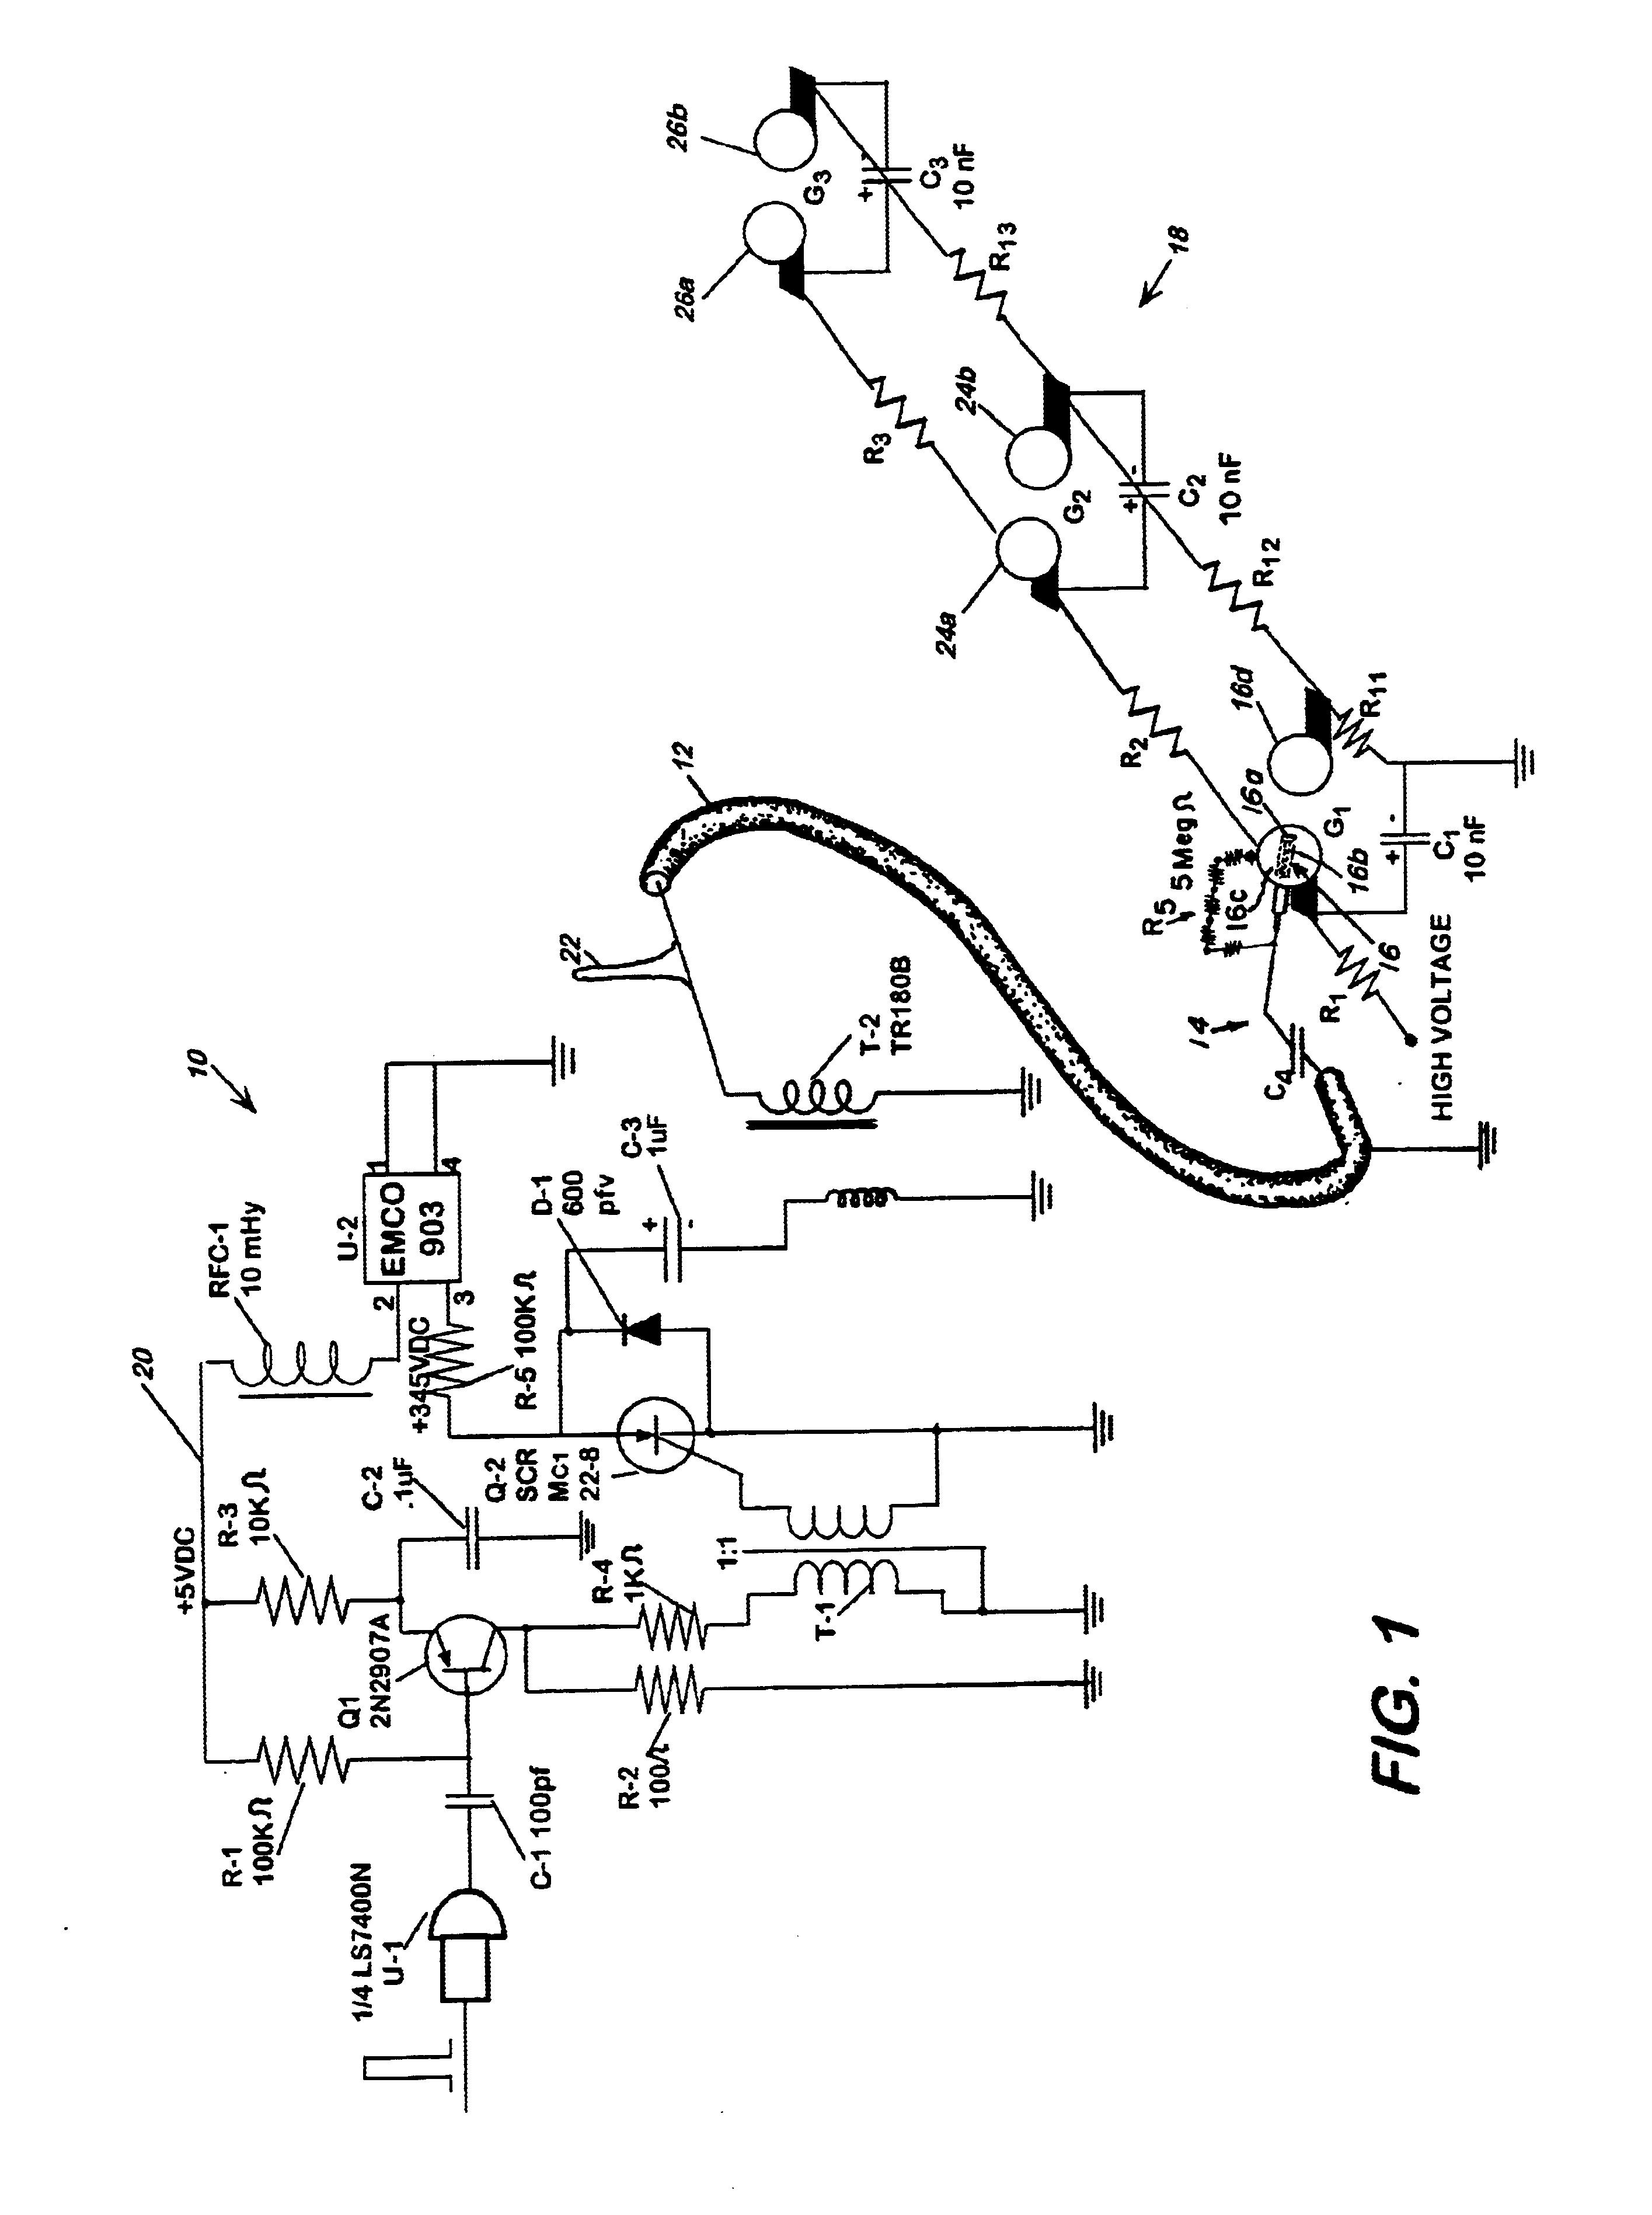 brevet us6690566 trigger circuit for marx generators brevets DC 5V Adapter patent drawing